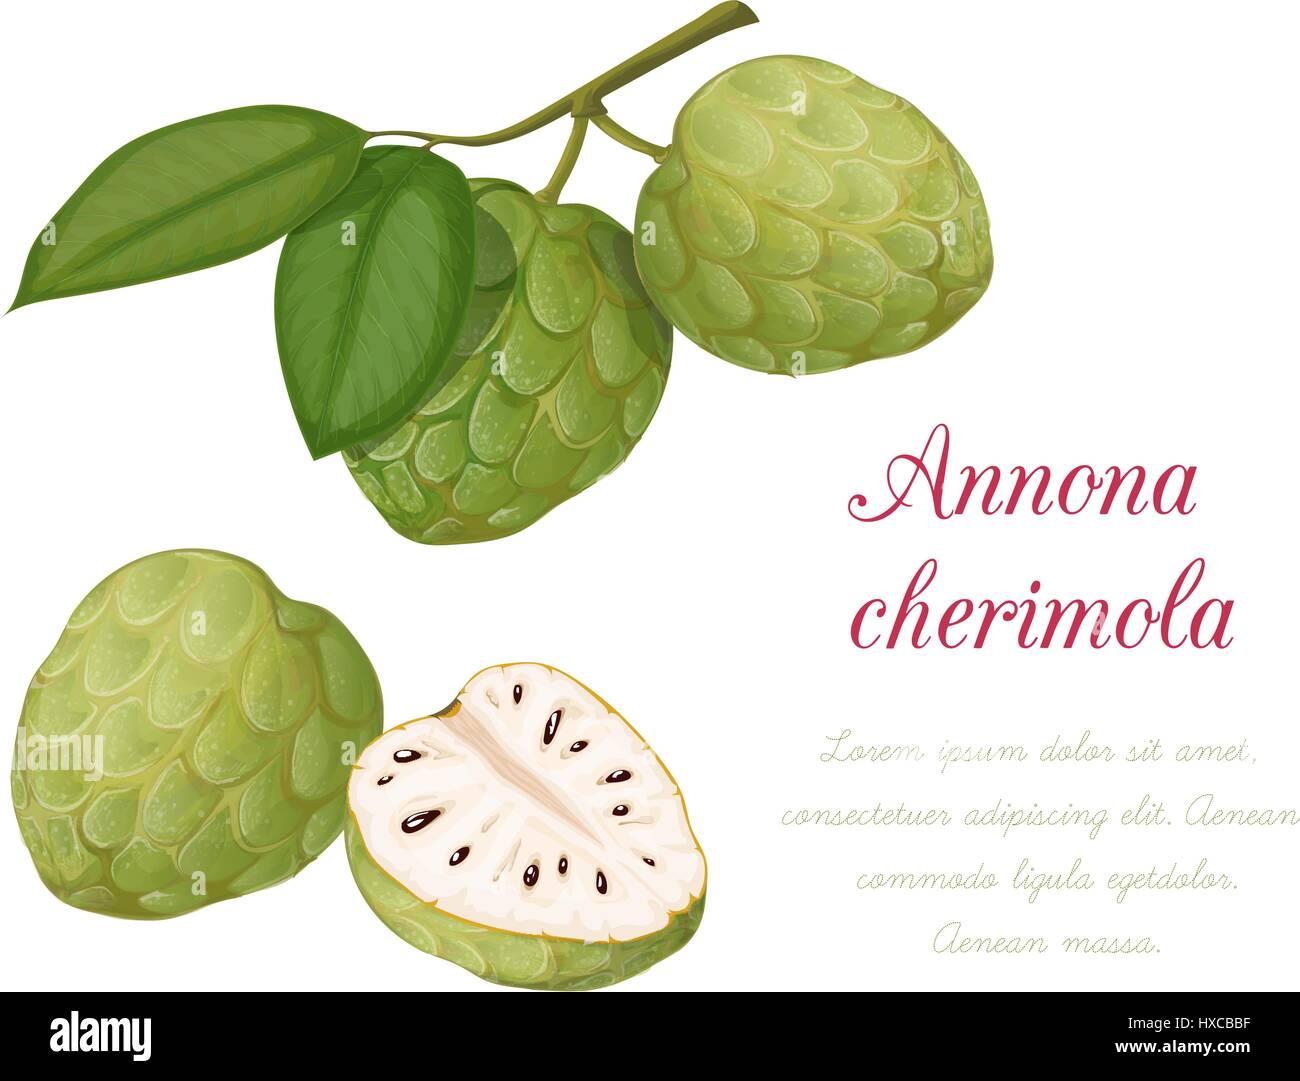 Vector Illustration Of Sugar Apple Annona Cherimoya A Series Exotic Fruits It